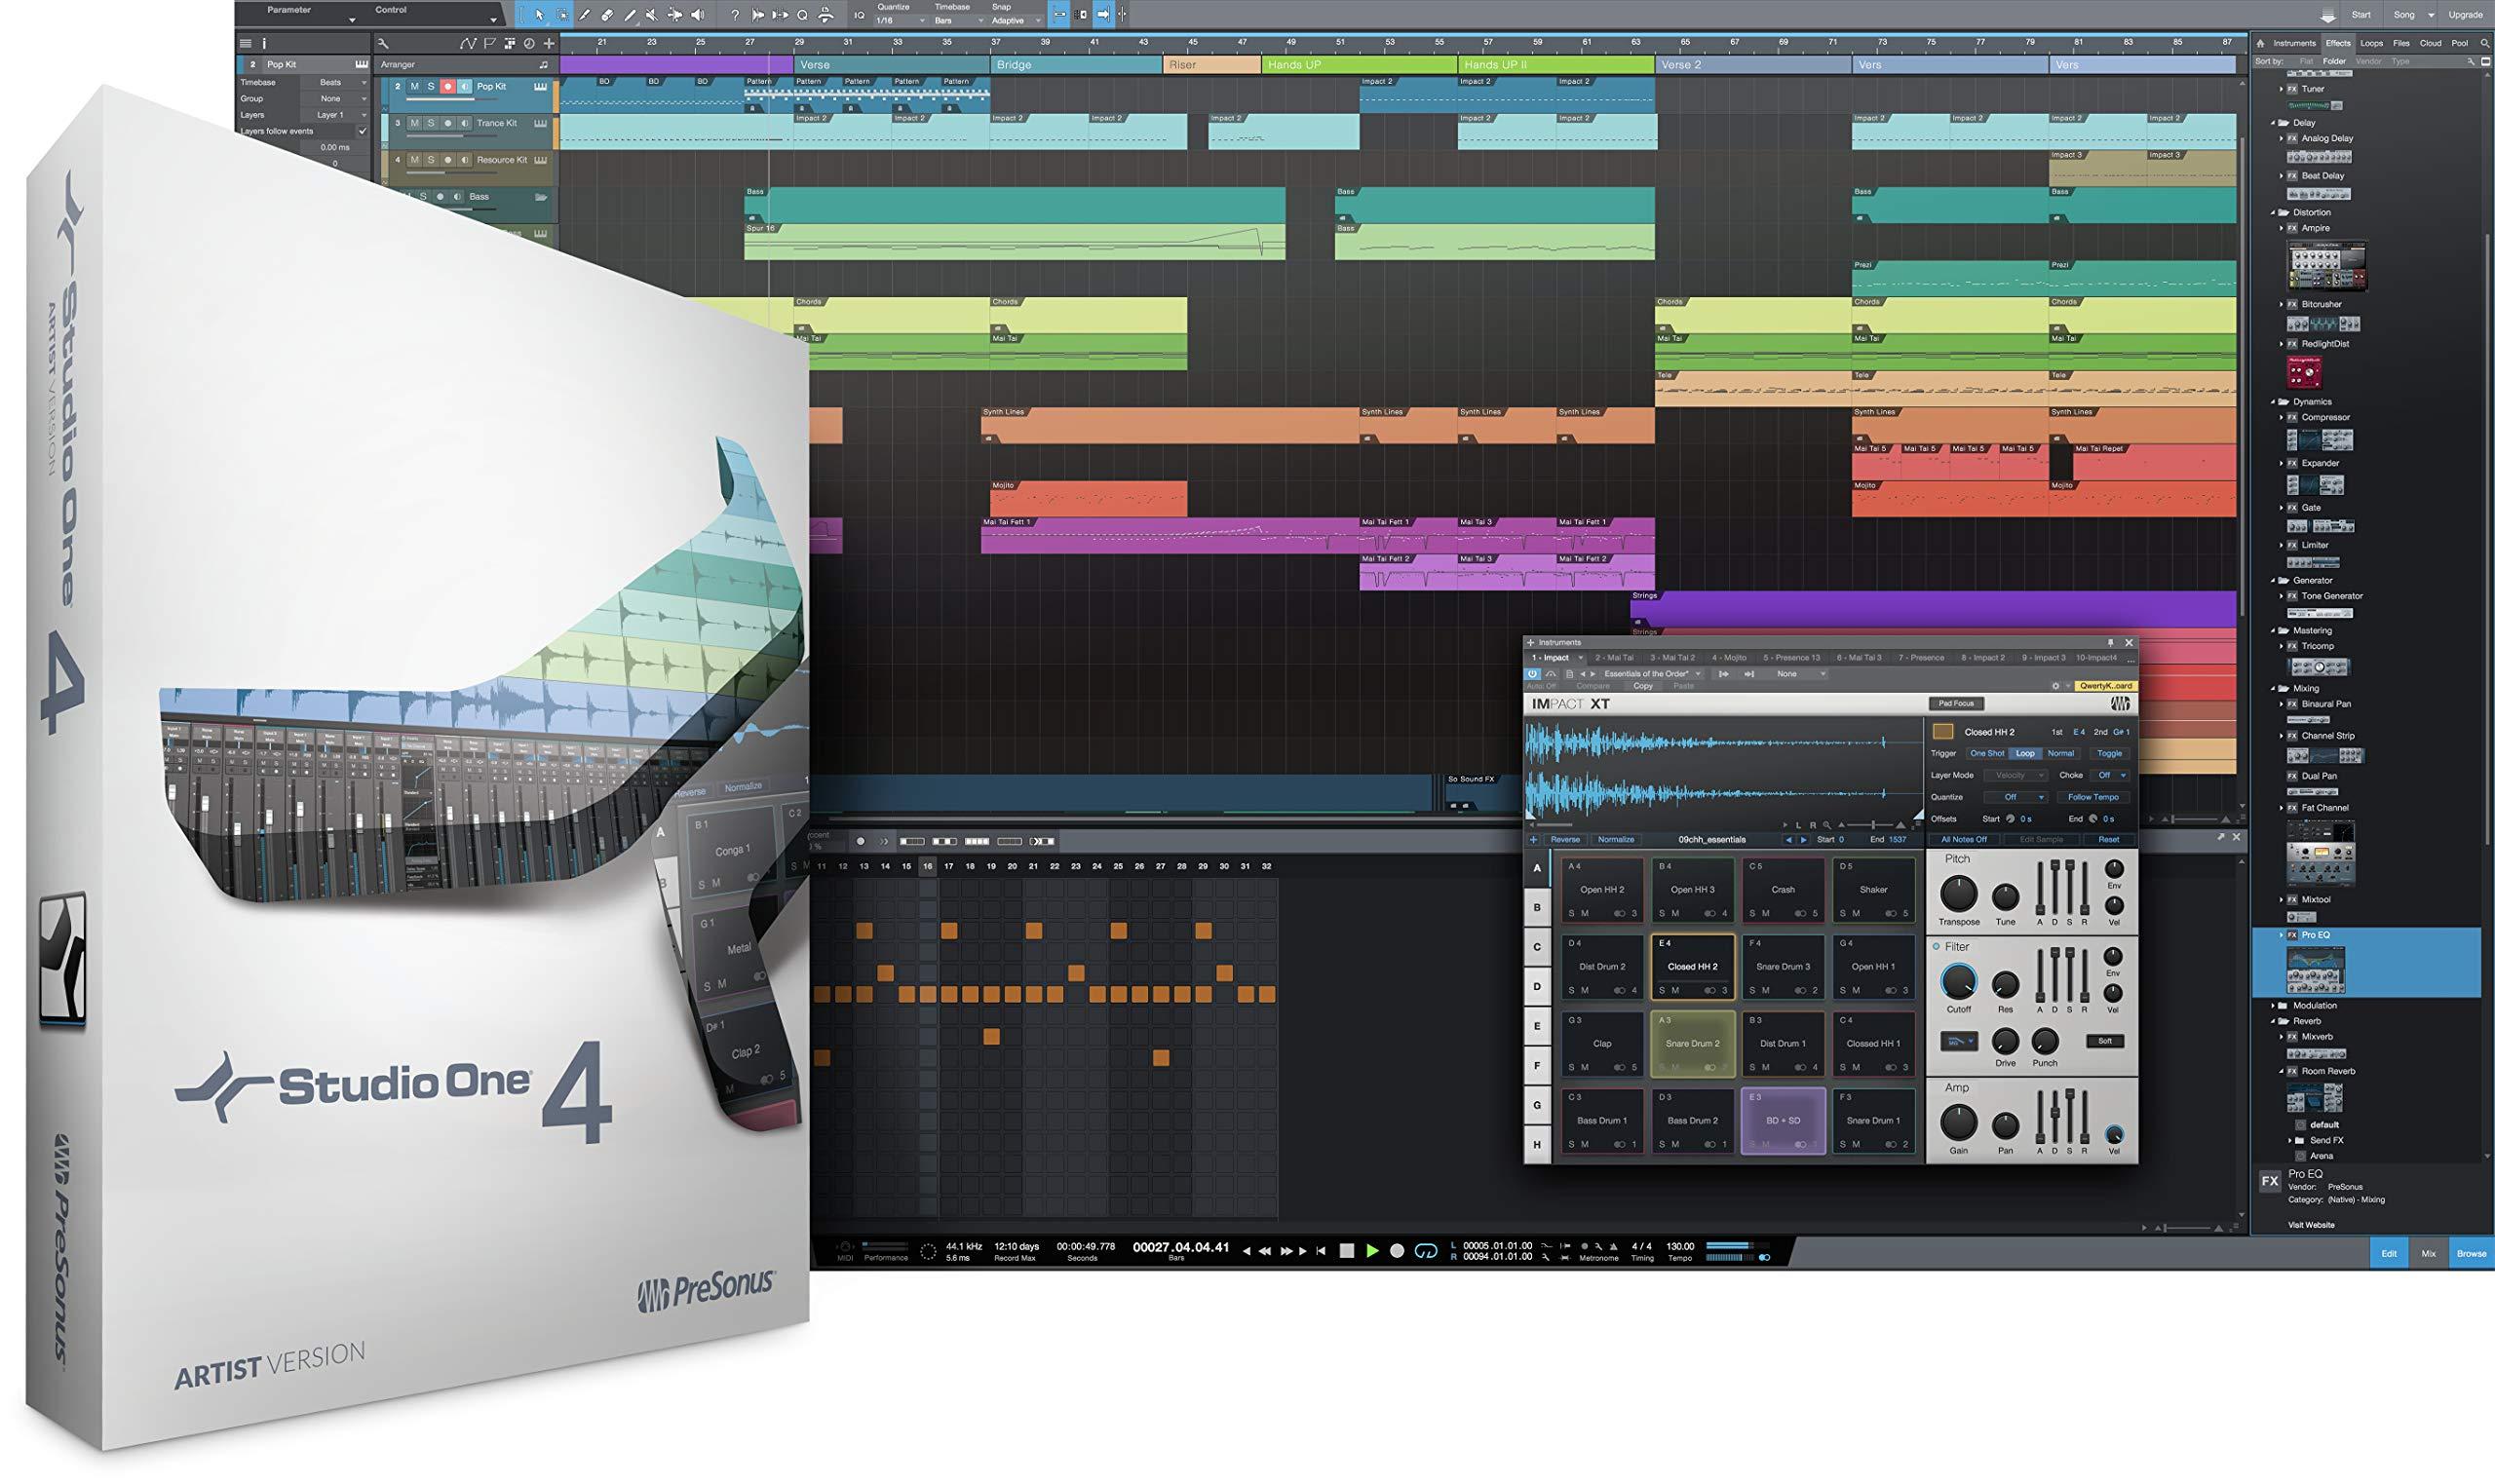 StudioLive 16.0.2. USB